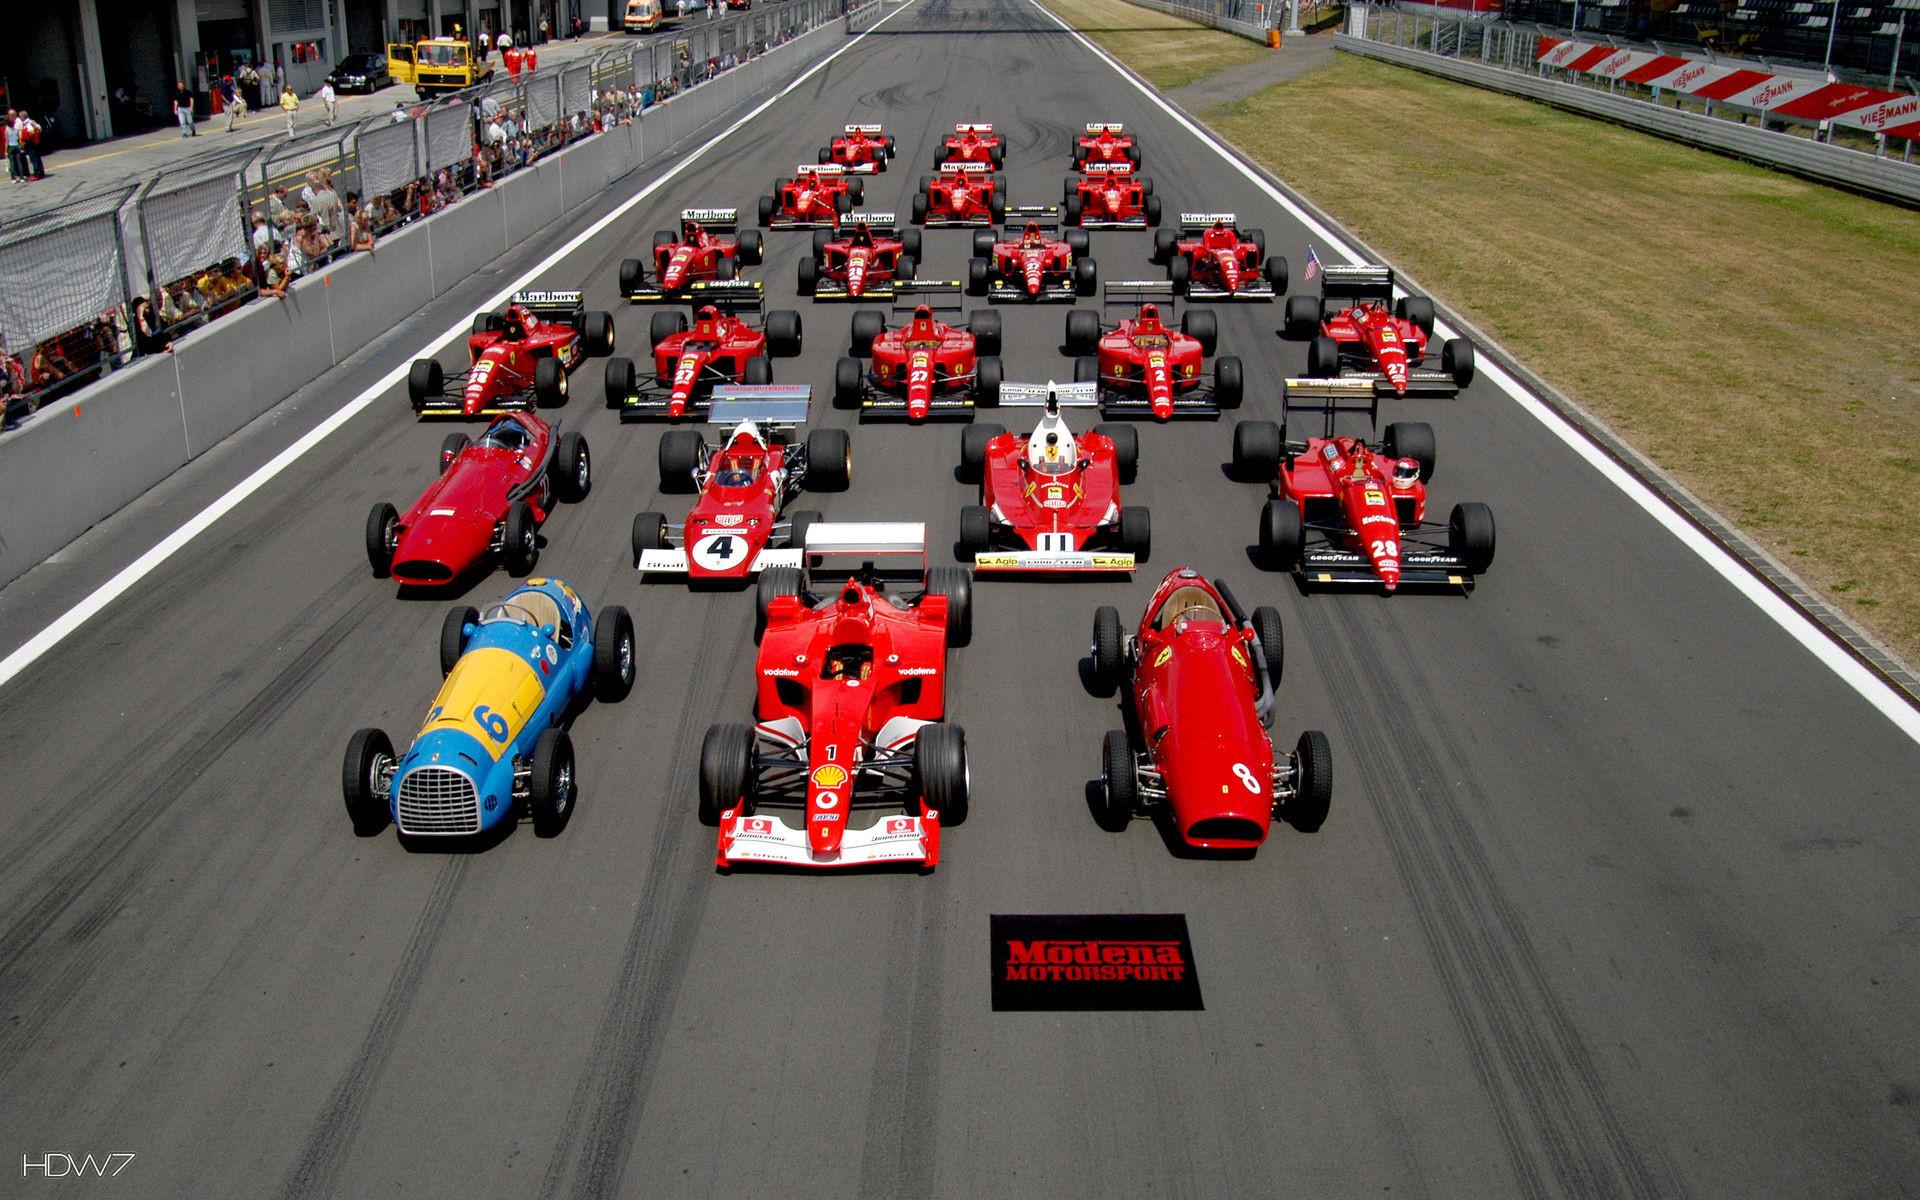 ferrari formula 1 history cars on a circuit wallpaper